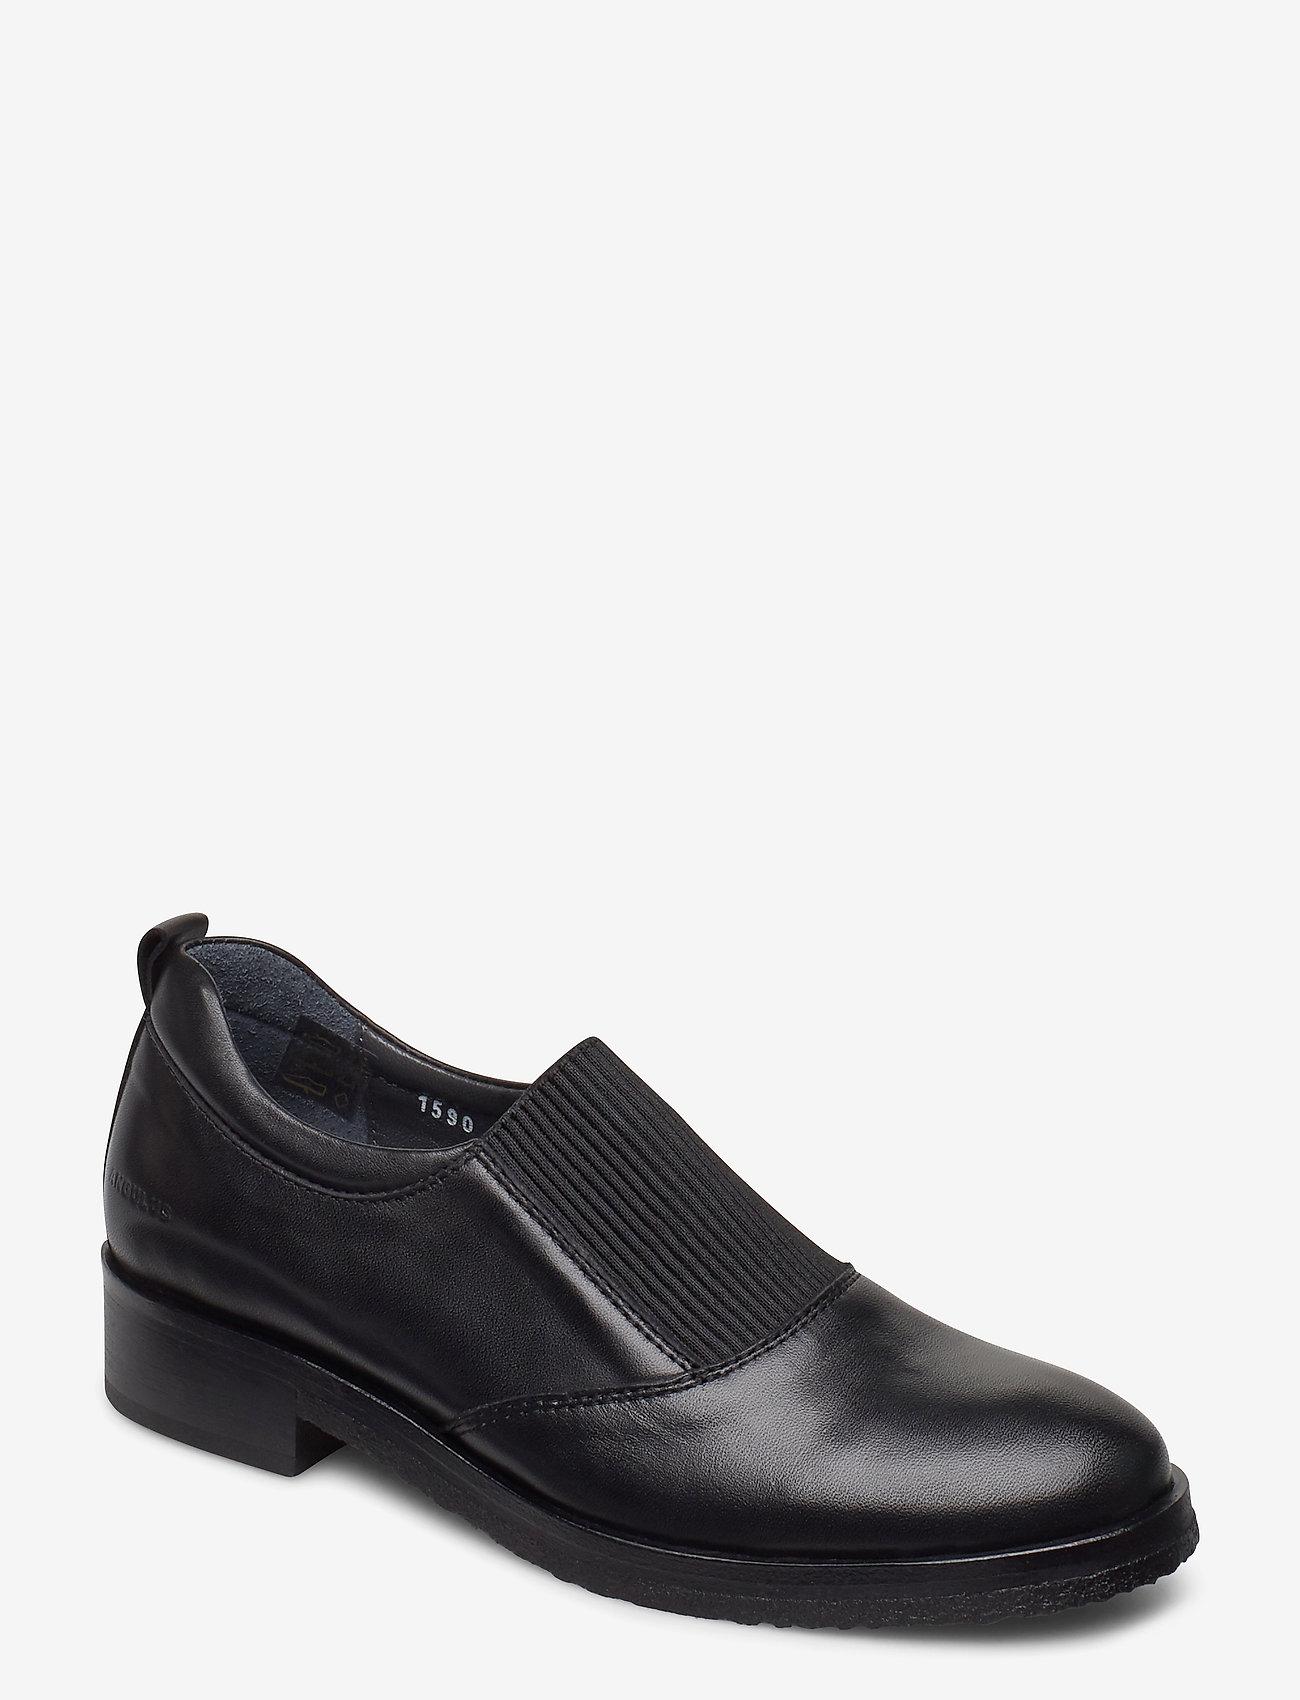 ANGULUS - Shoes - flat - with elastic - loaferit - 1604/019 black/black - 0